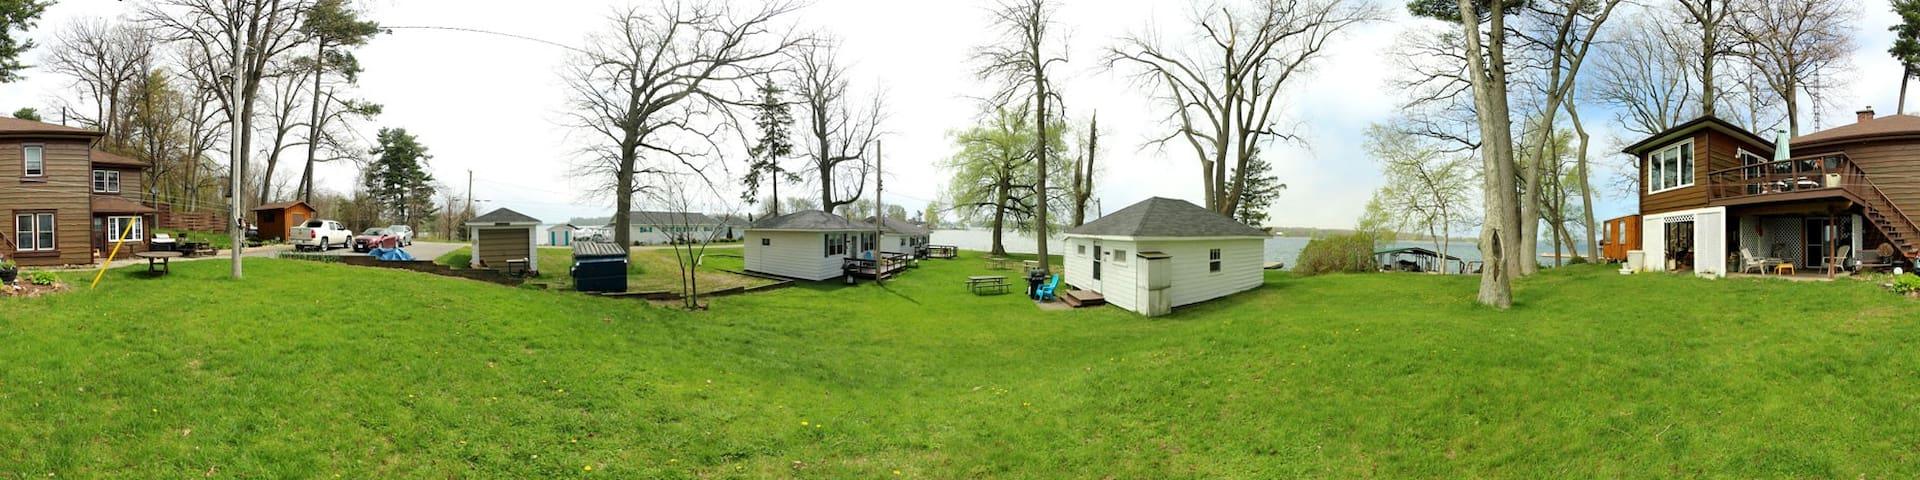 The Pines Riverfront Cottages - Cottage 3